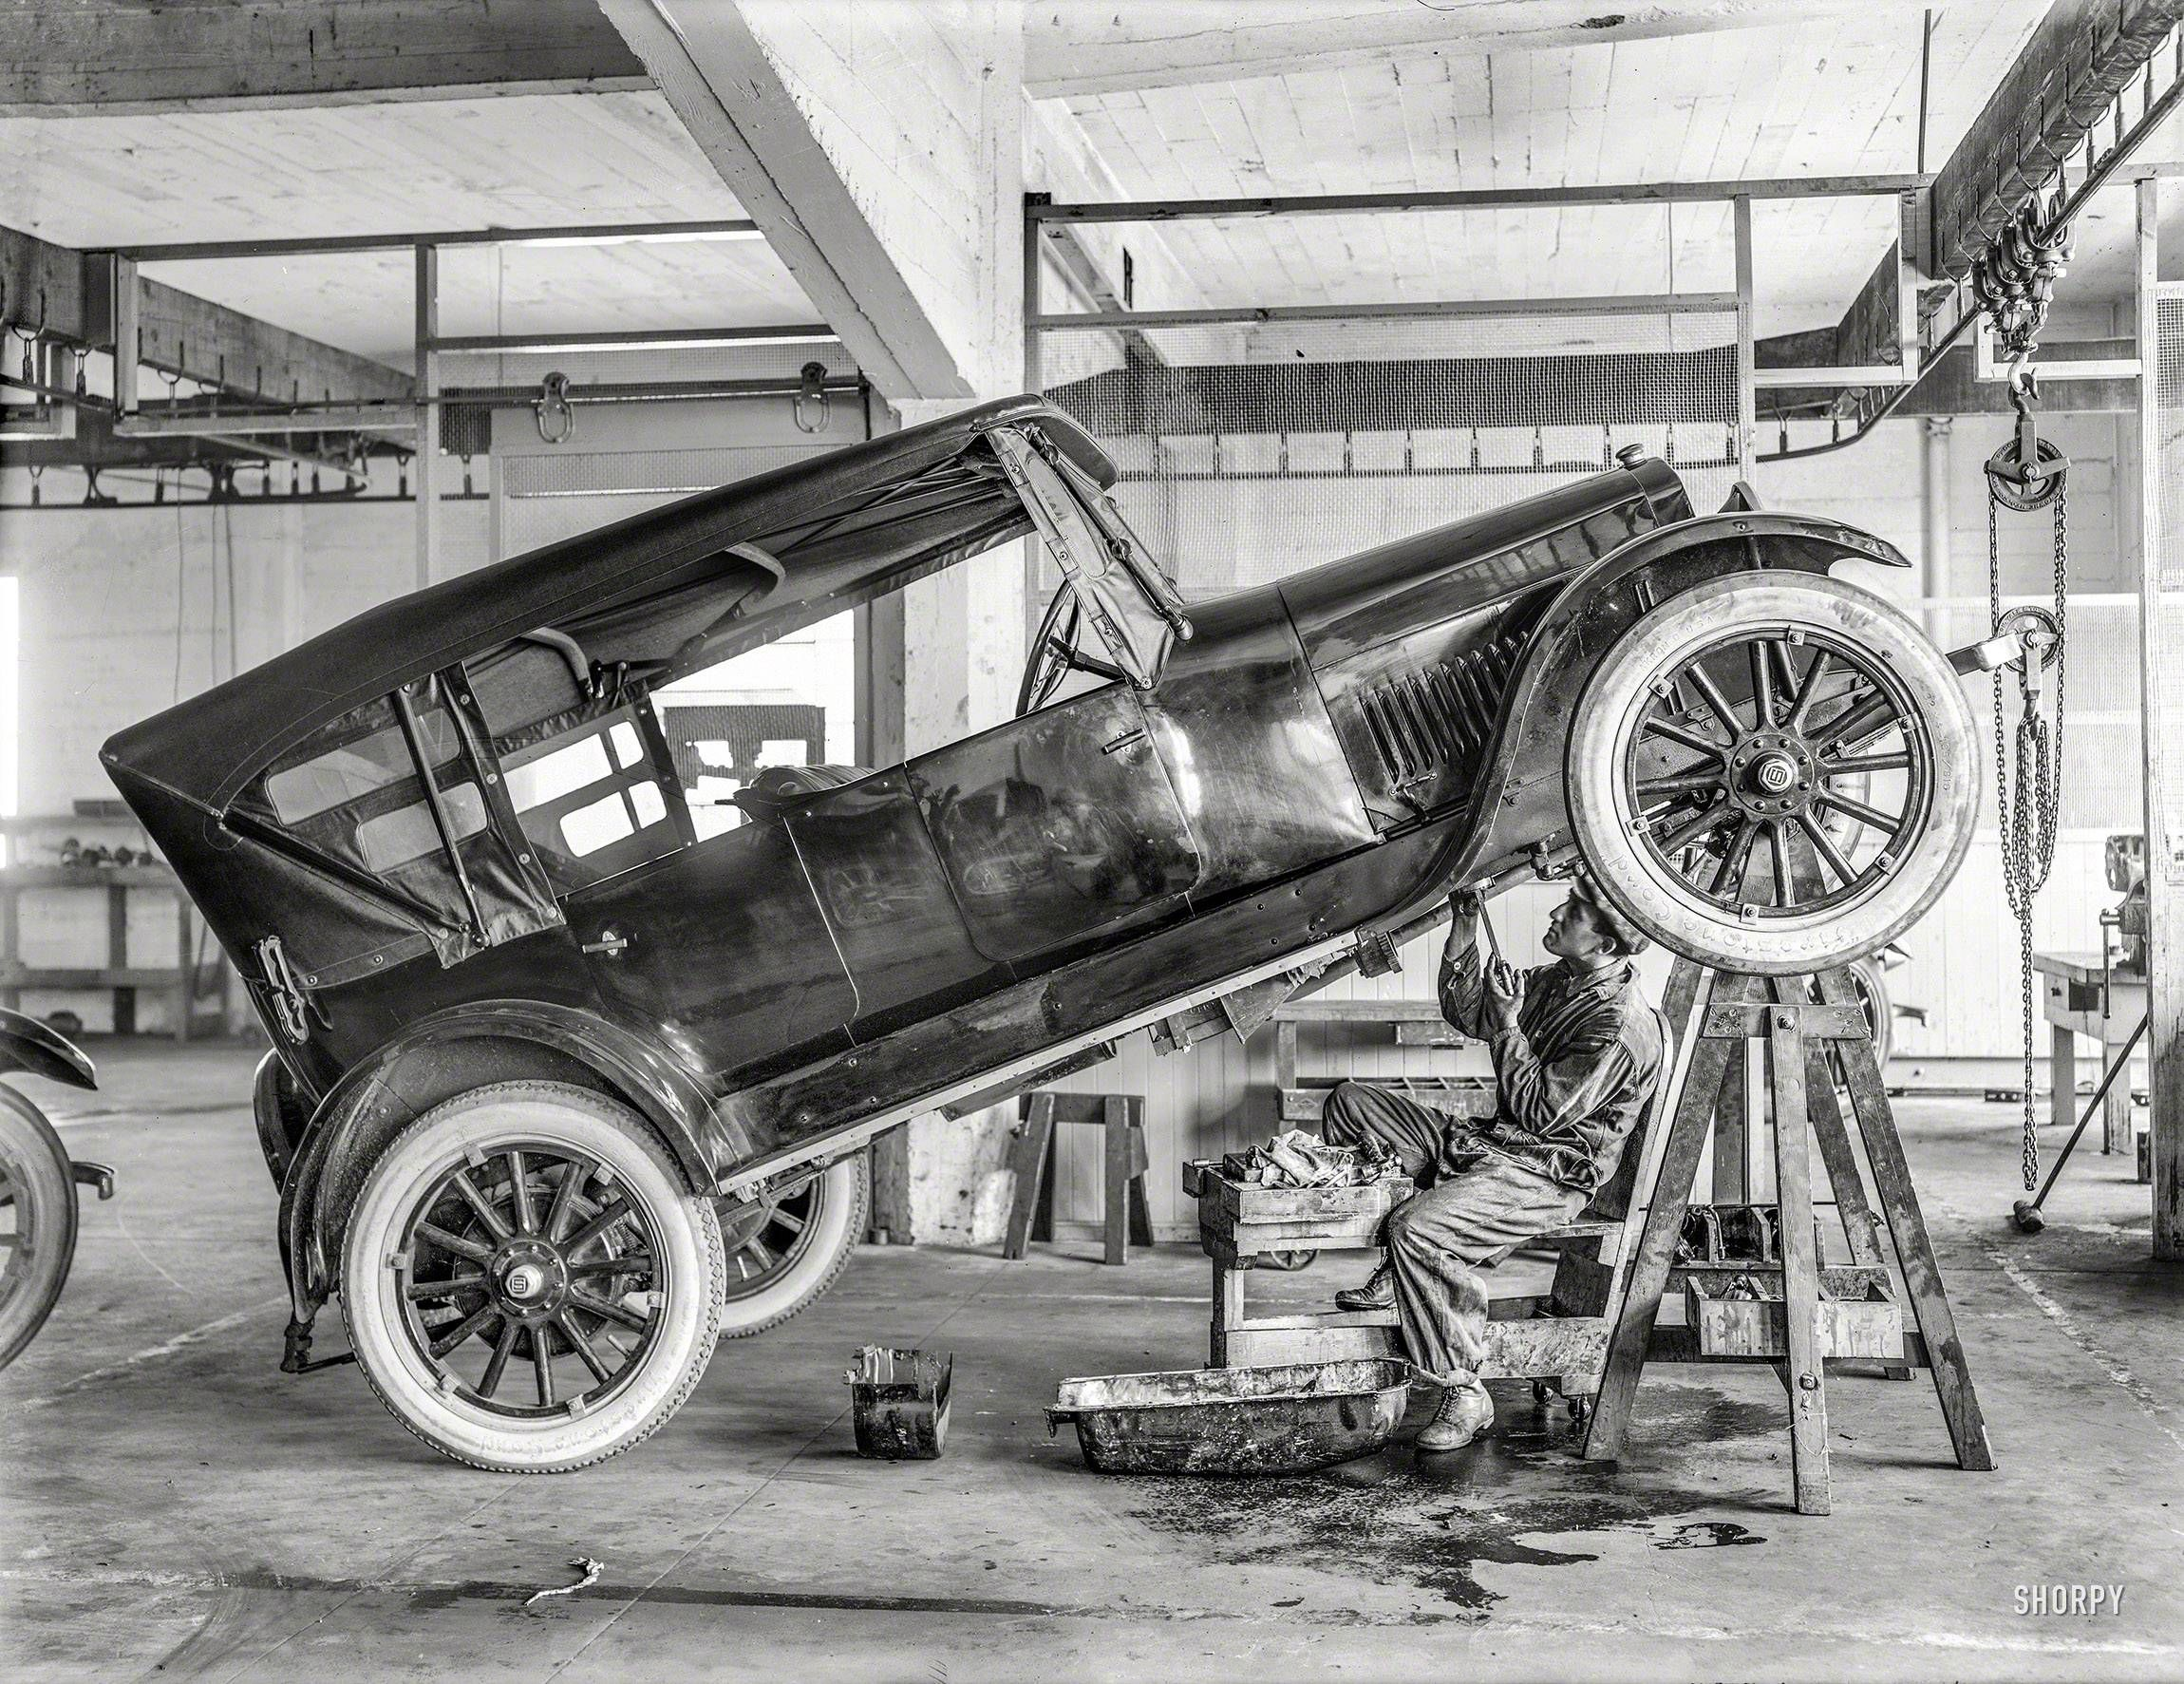 Car interior restoration jacksonville fl - Mechanic Working On An Old Studebaker In Repair Shop C 1919